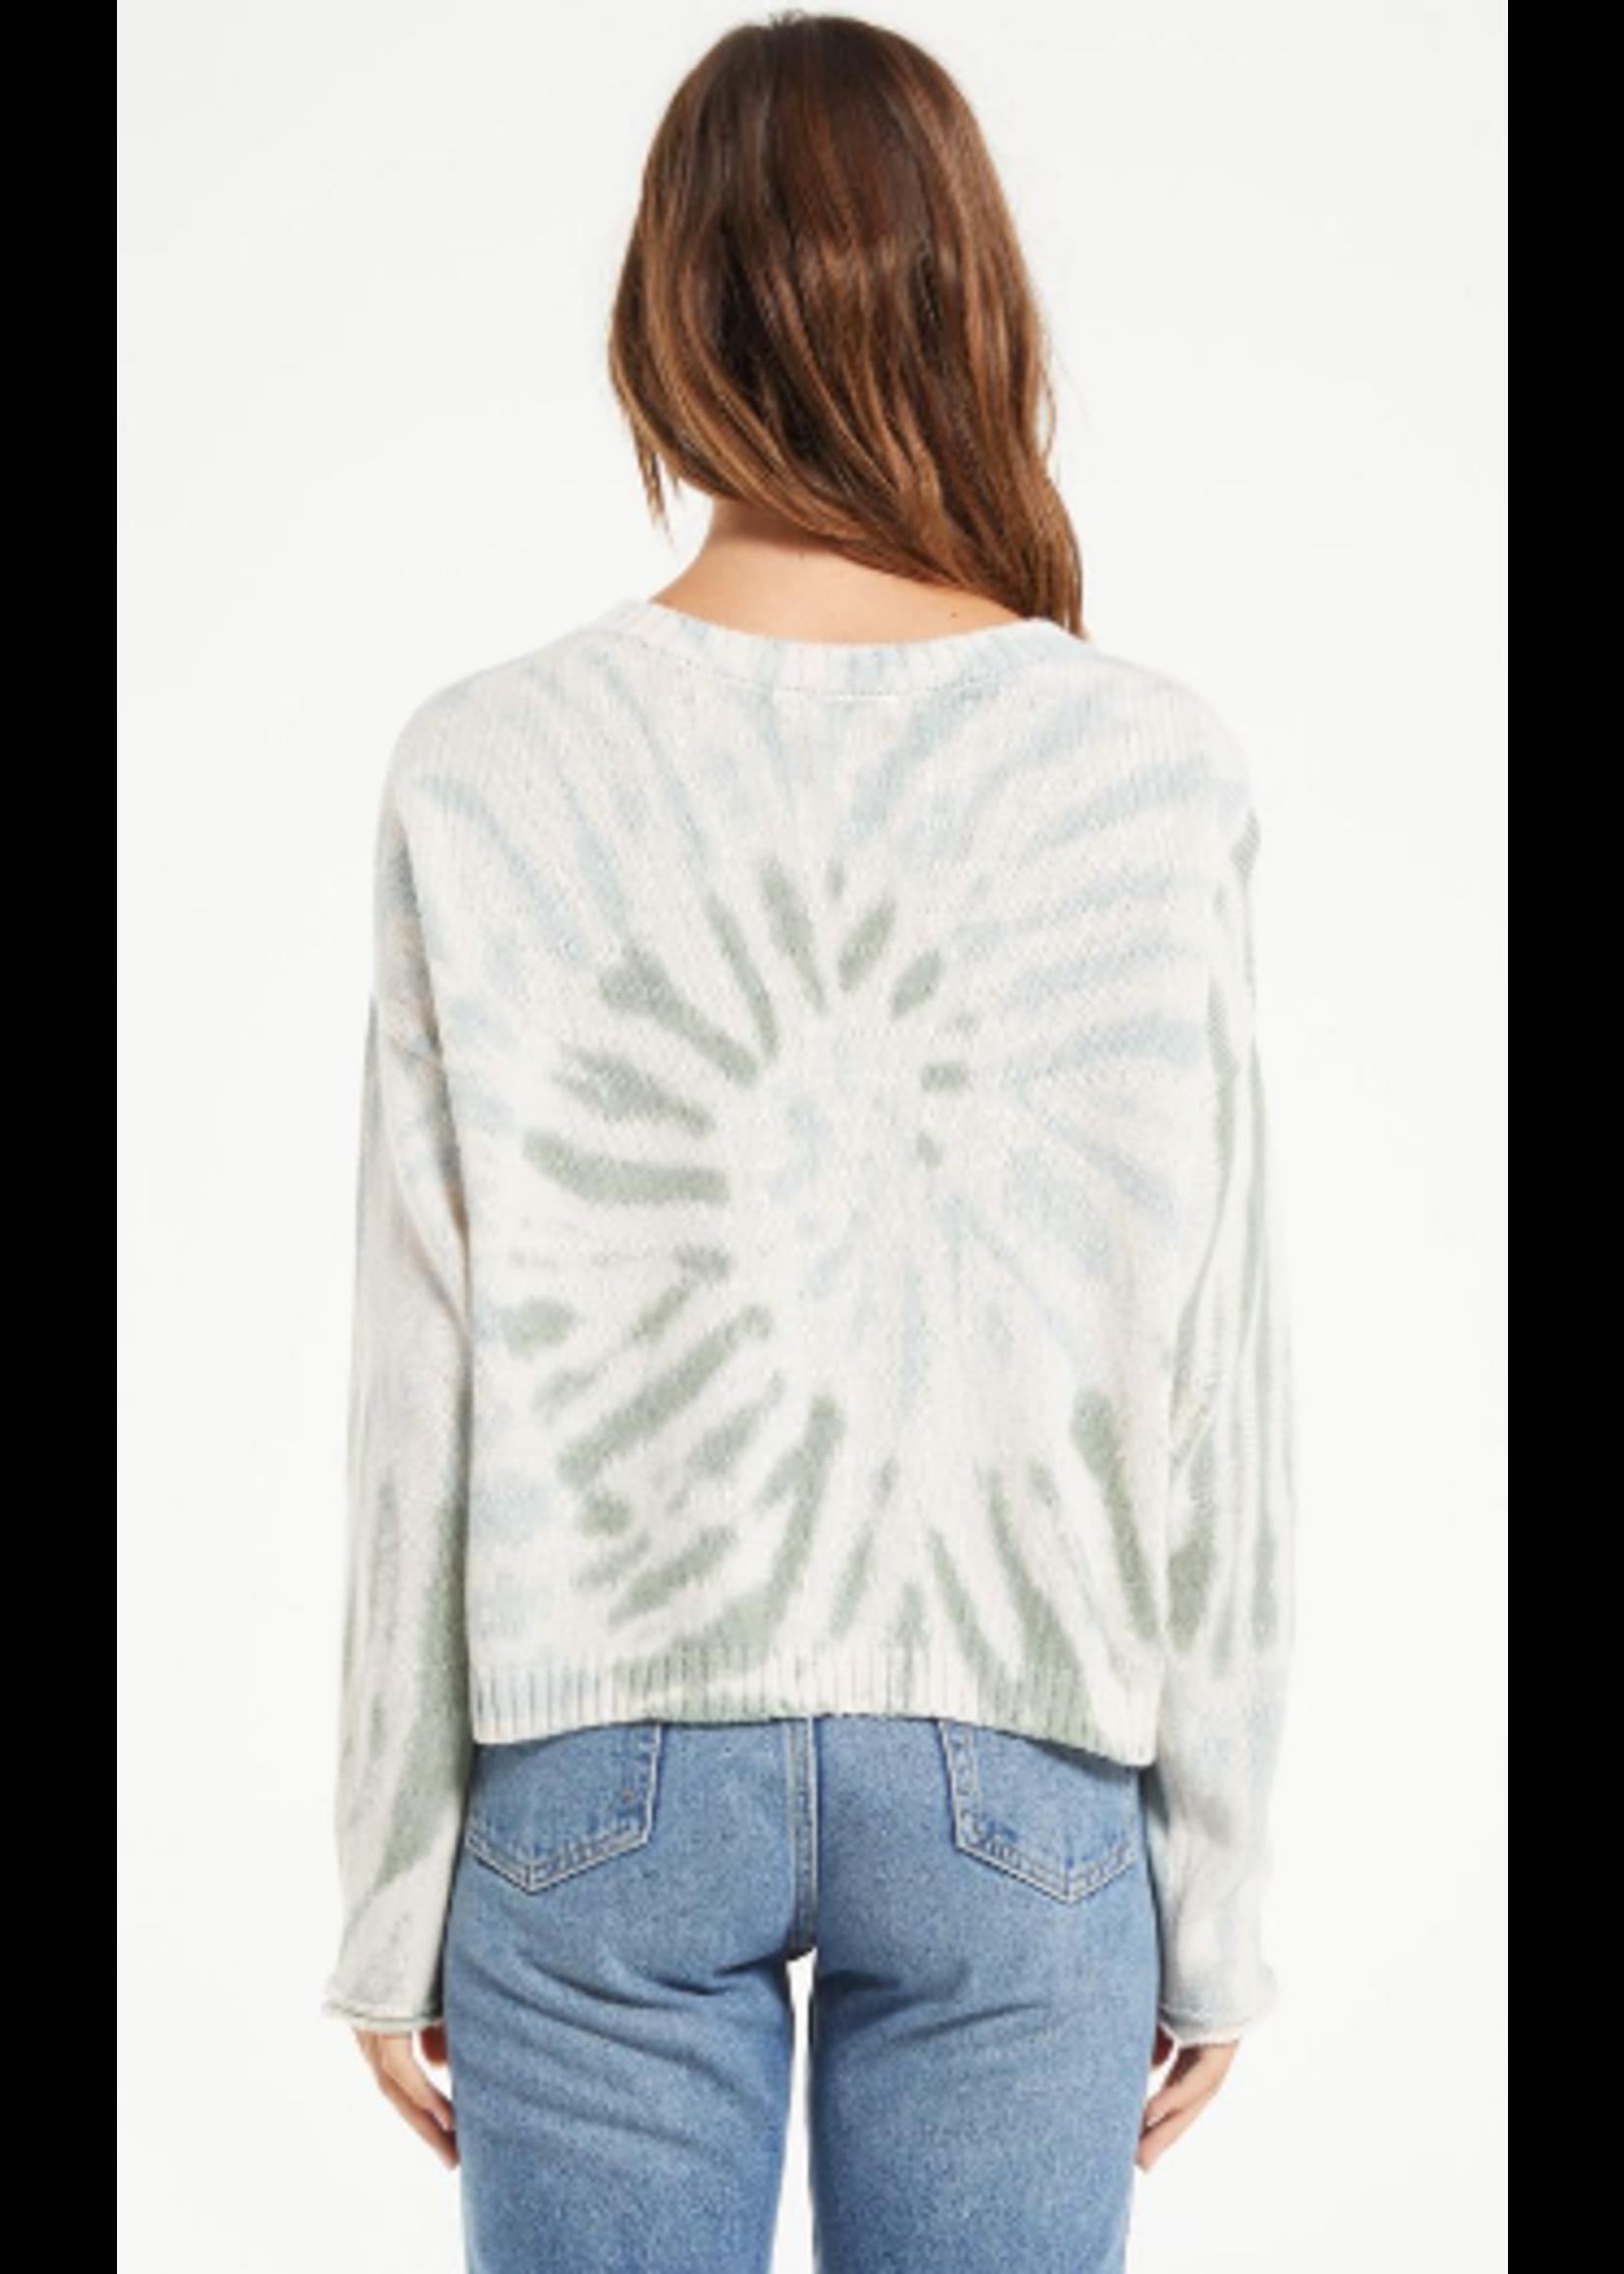 Z Supply Sienna Tie Dye Sweater